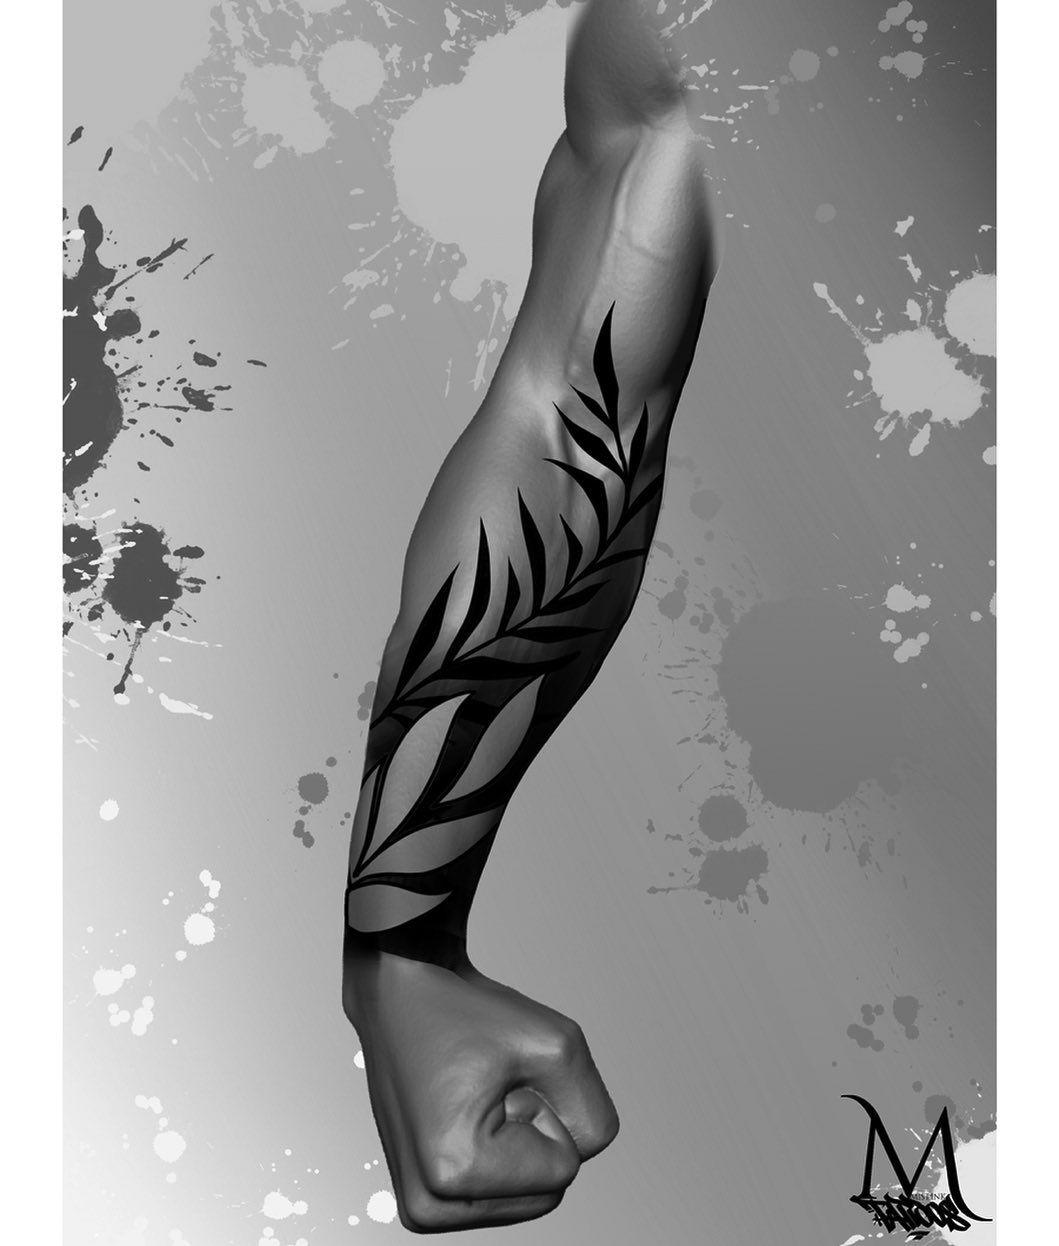 TATTOO DESIGN . . . #wannadotattoo #aftercorona #sleevetattoo #tattoodesign #tattooidea #procreate #design #designing #tattooartist #tattooart #leavestattoo #stayfocused #alesund #ålesundtattoo #mist